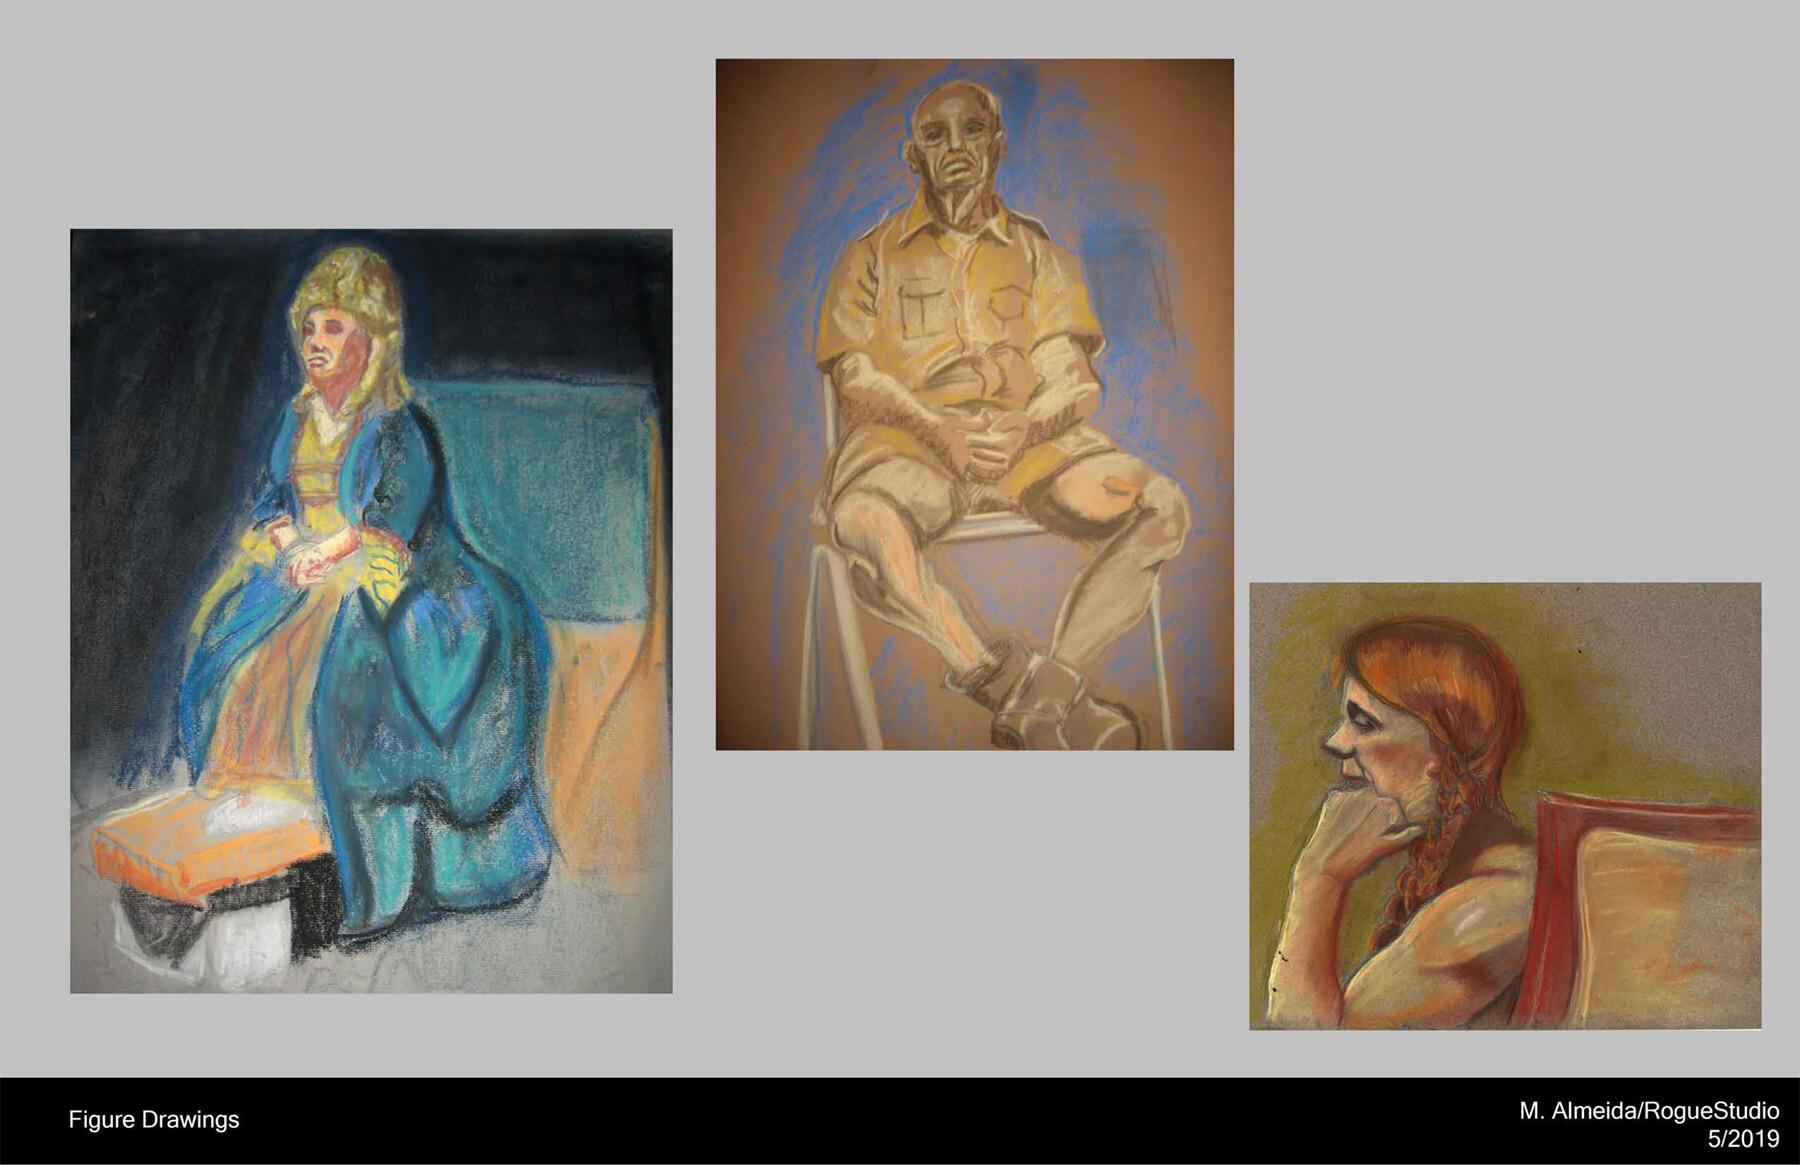 Figure Drawings Medium: Pastel and graphite